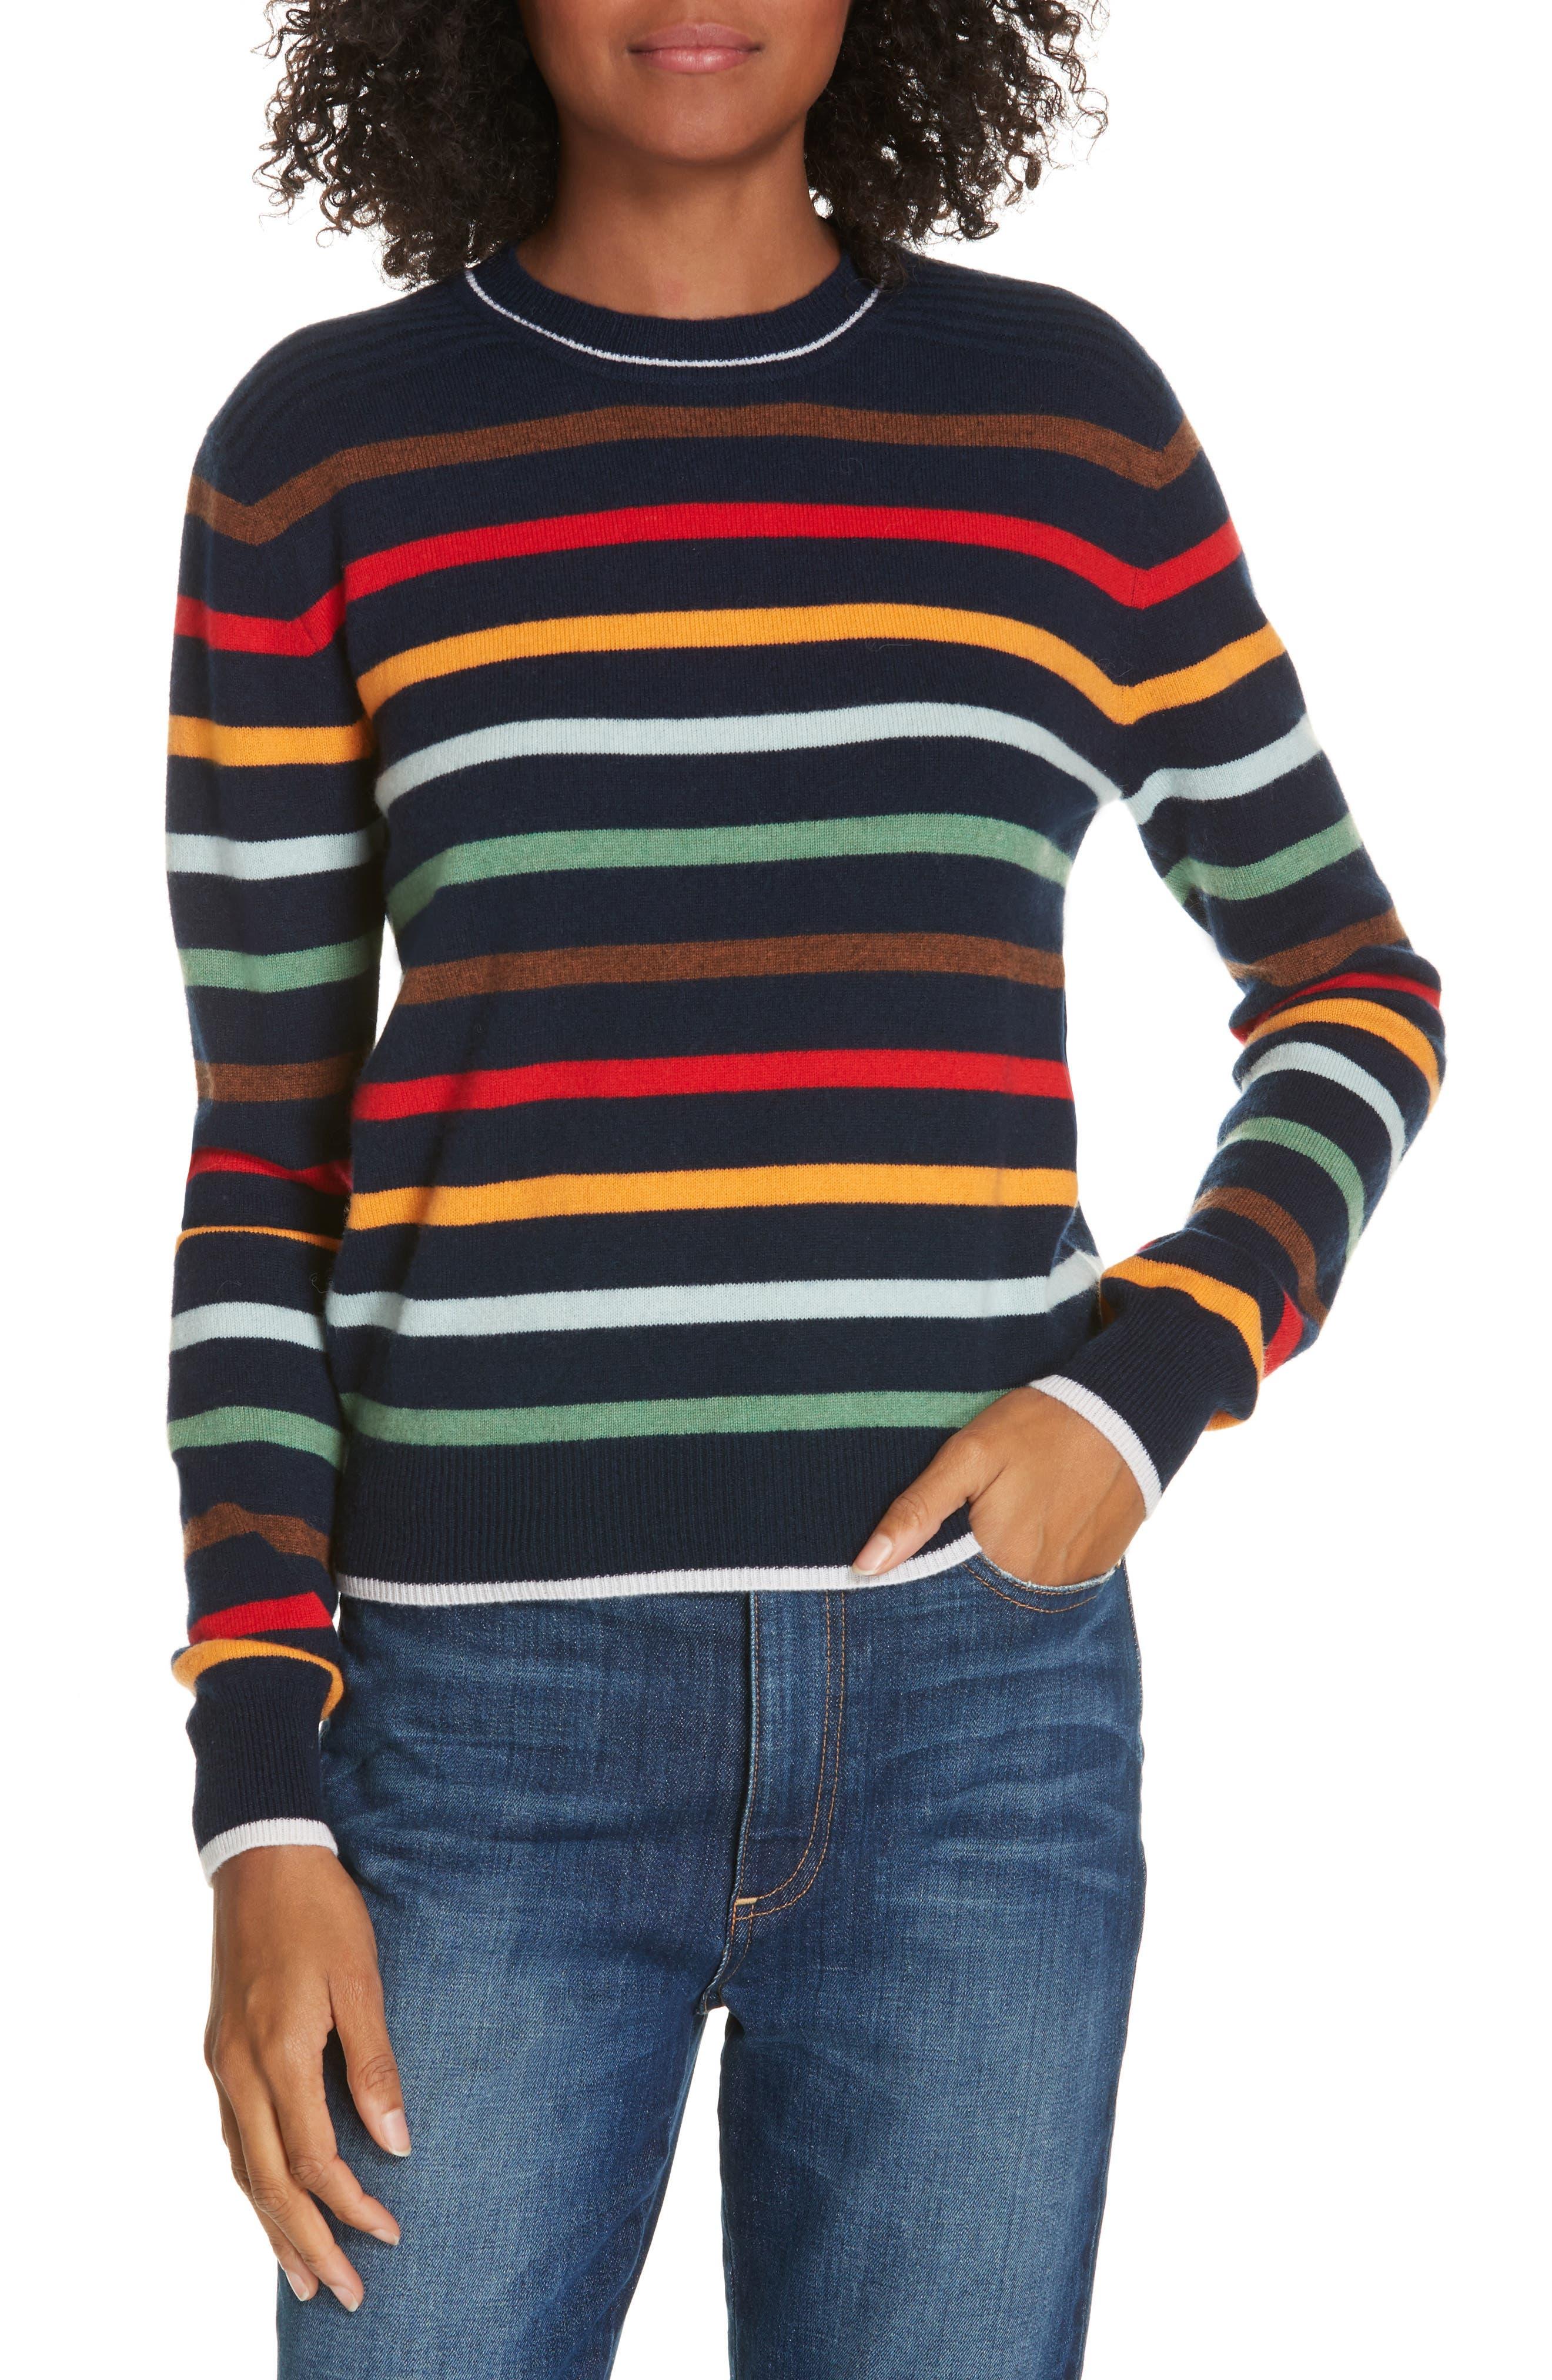 Rainbow Neat Wool & Cashmere Sweater, Main, color, NAVY/ RAINBOW